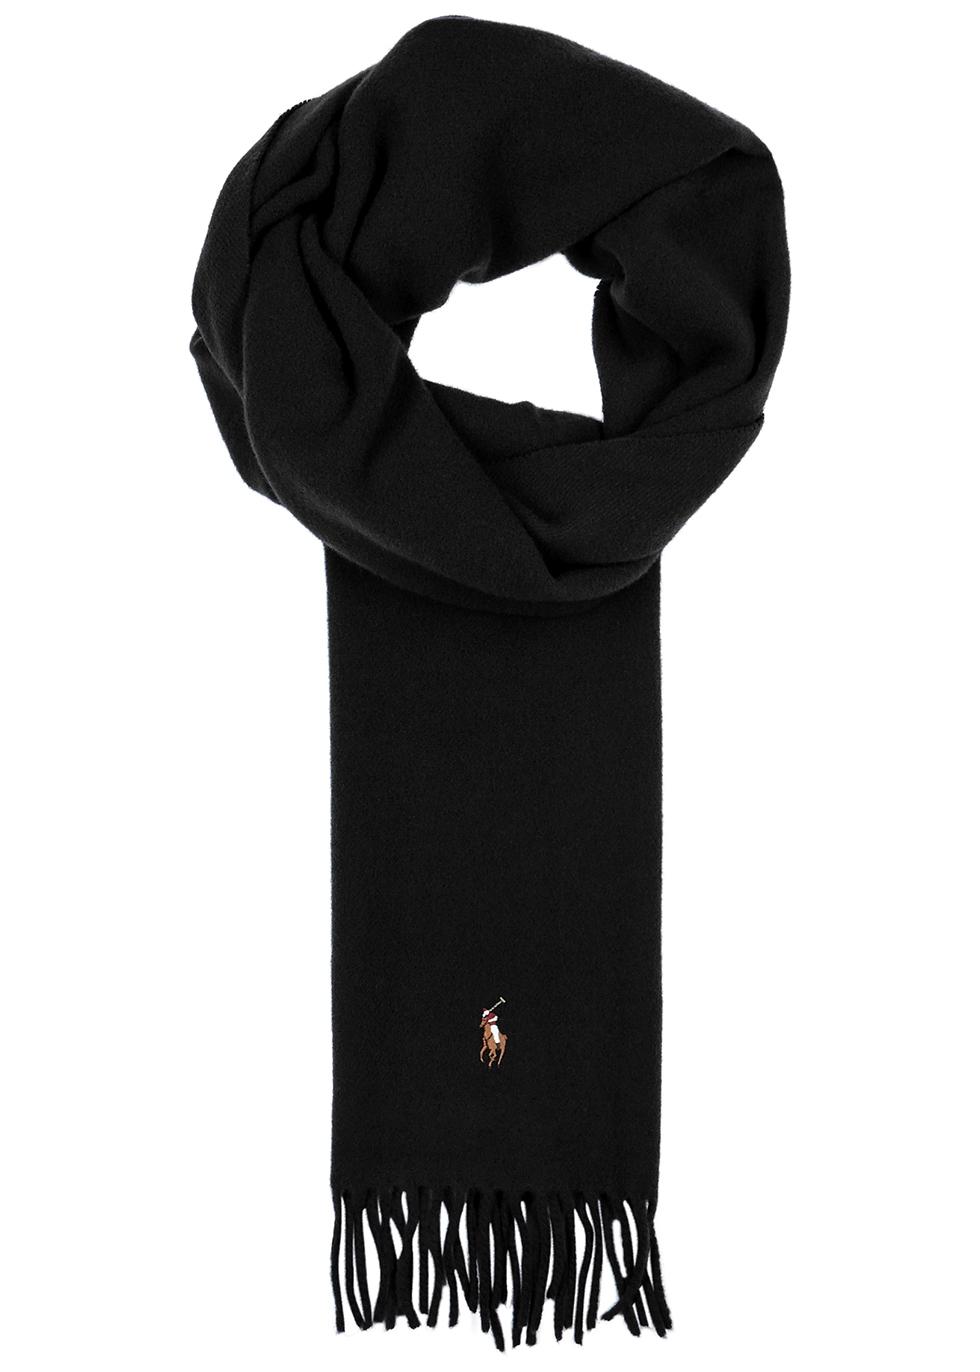 8440e44b1 Men's Designer Scarves and Accessories - Harvey Nichols